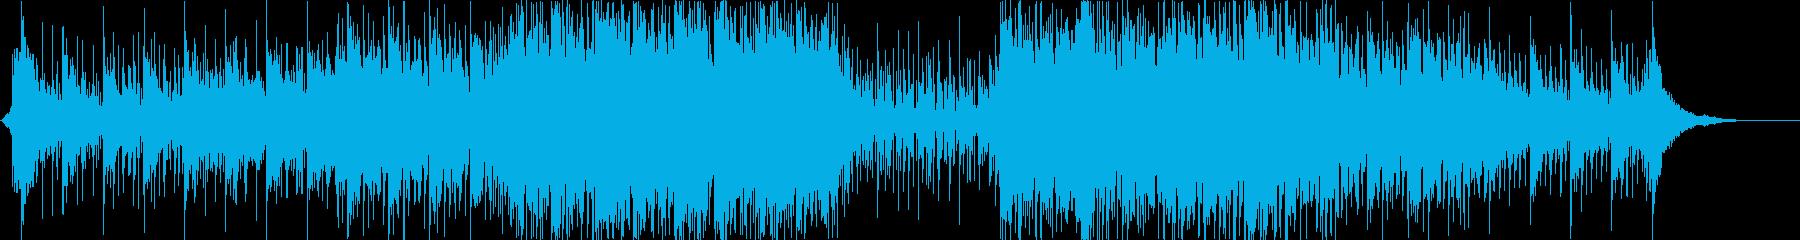 CM企業VP・ダンス・テクノロジー系の再生済みの波形